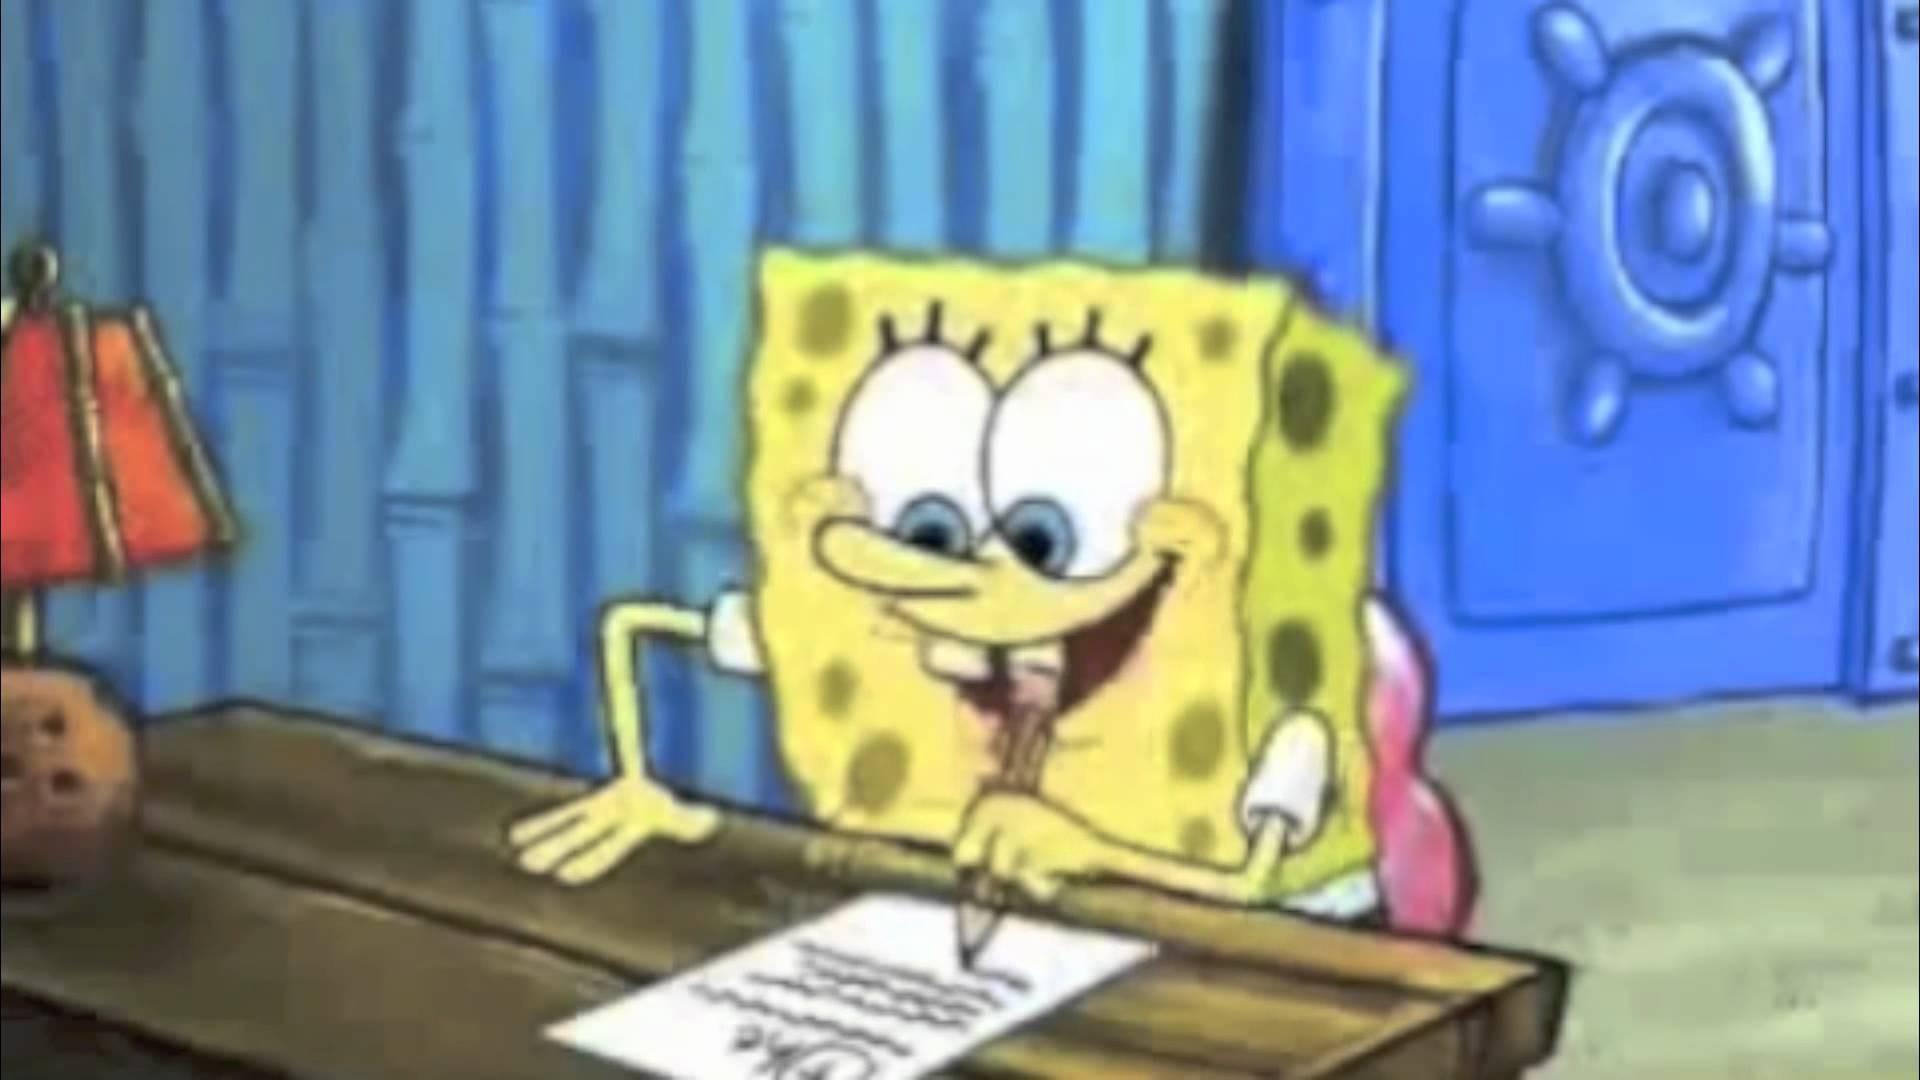 019 Spongebob Writing His Essay Help For Hours Maxresde Gif The Rap Font Meme Stirring Generator 1920